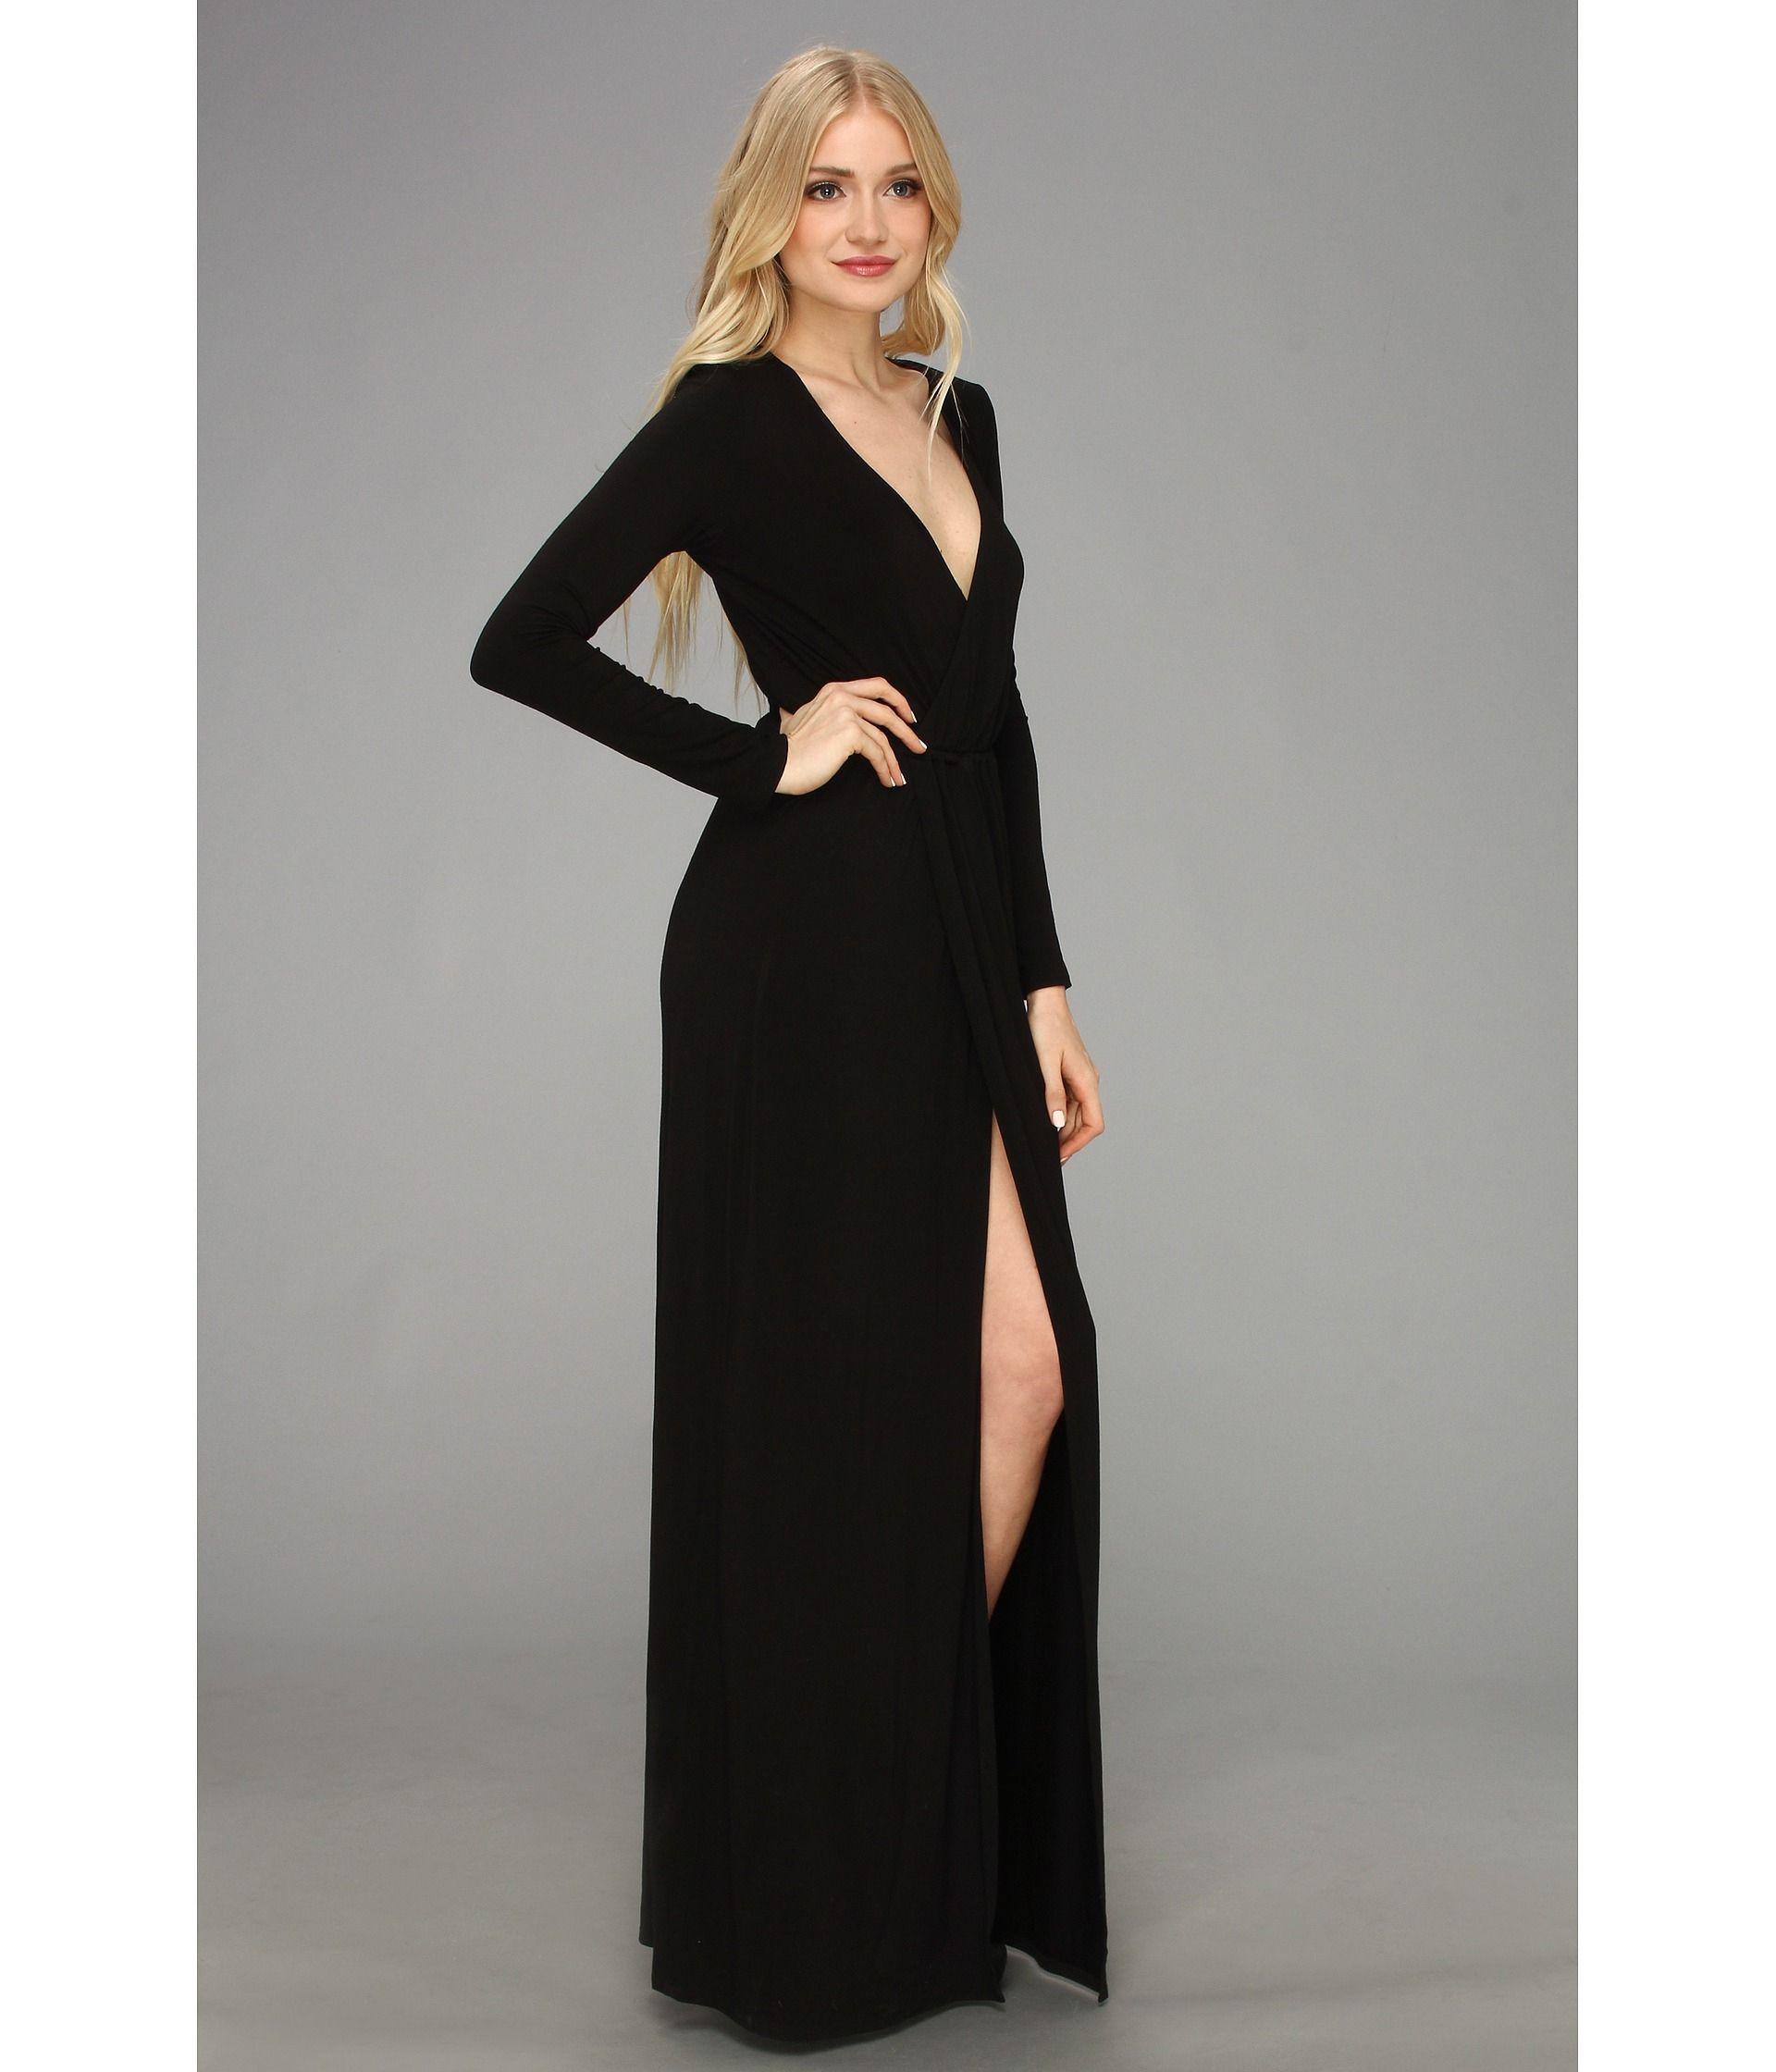 Long Sleeve Wrap Dress Formal   LongSleeve Dress   Pinterest   Dress ...